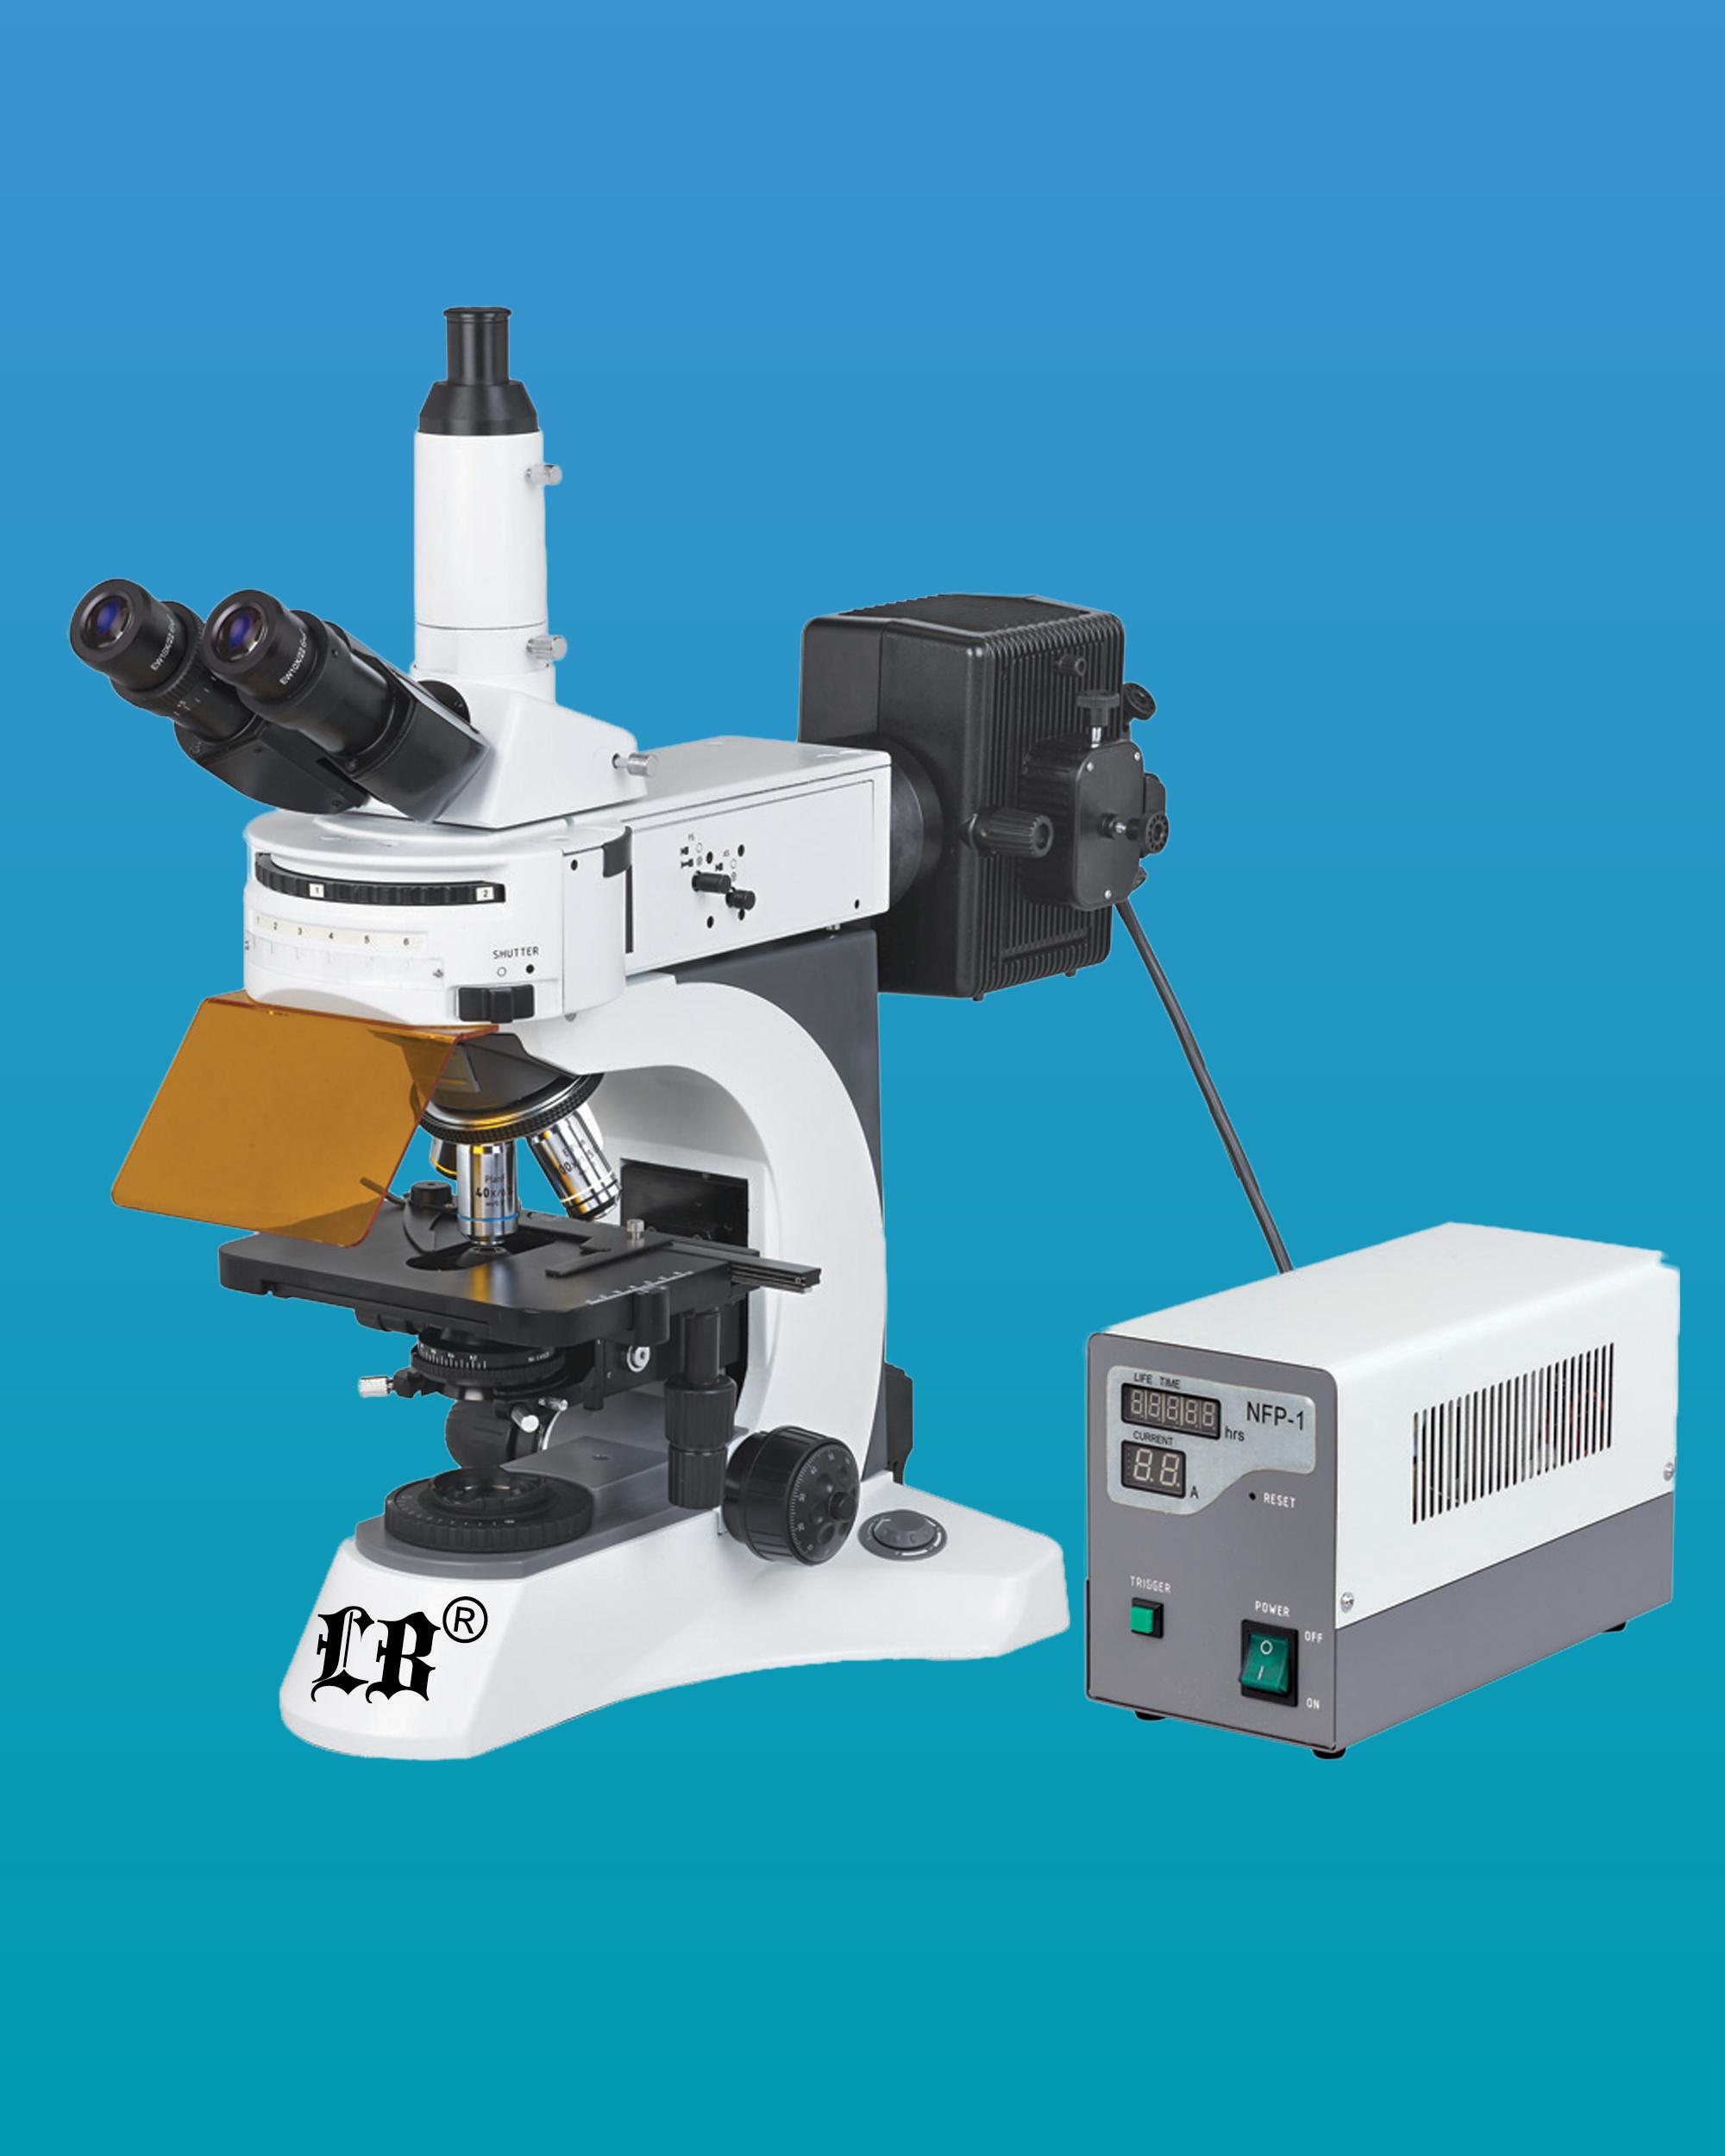 [LB-701] Trinocular Upright Flourescent Biological Microscope w/ Infinite Optical System